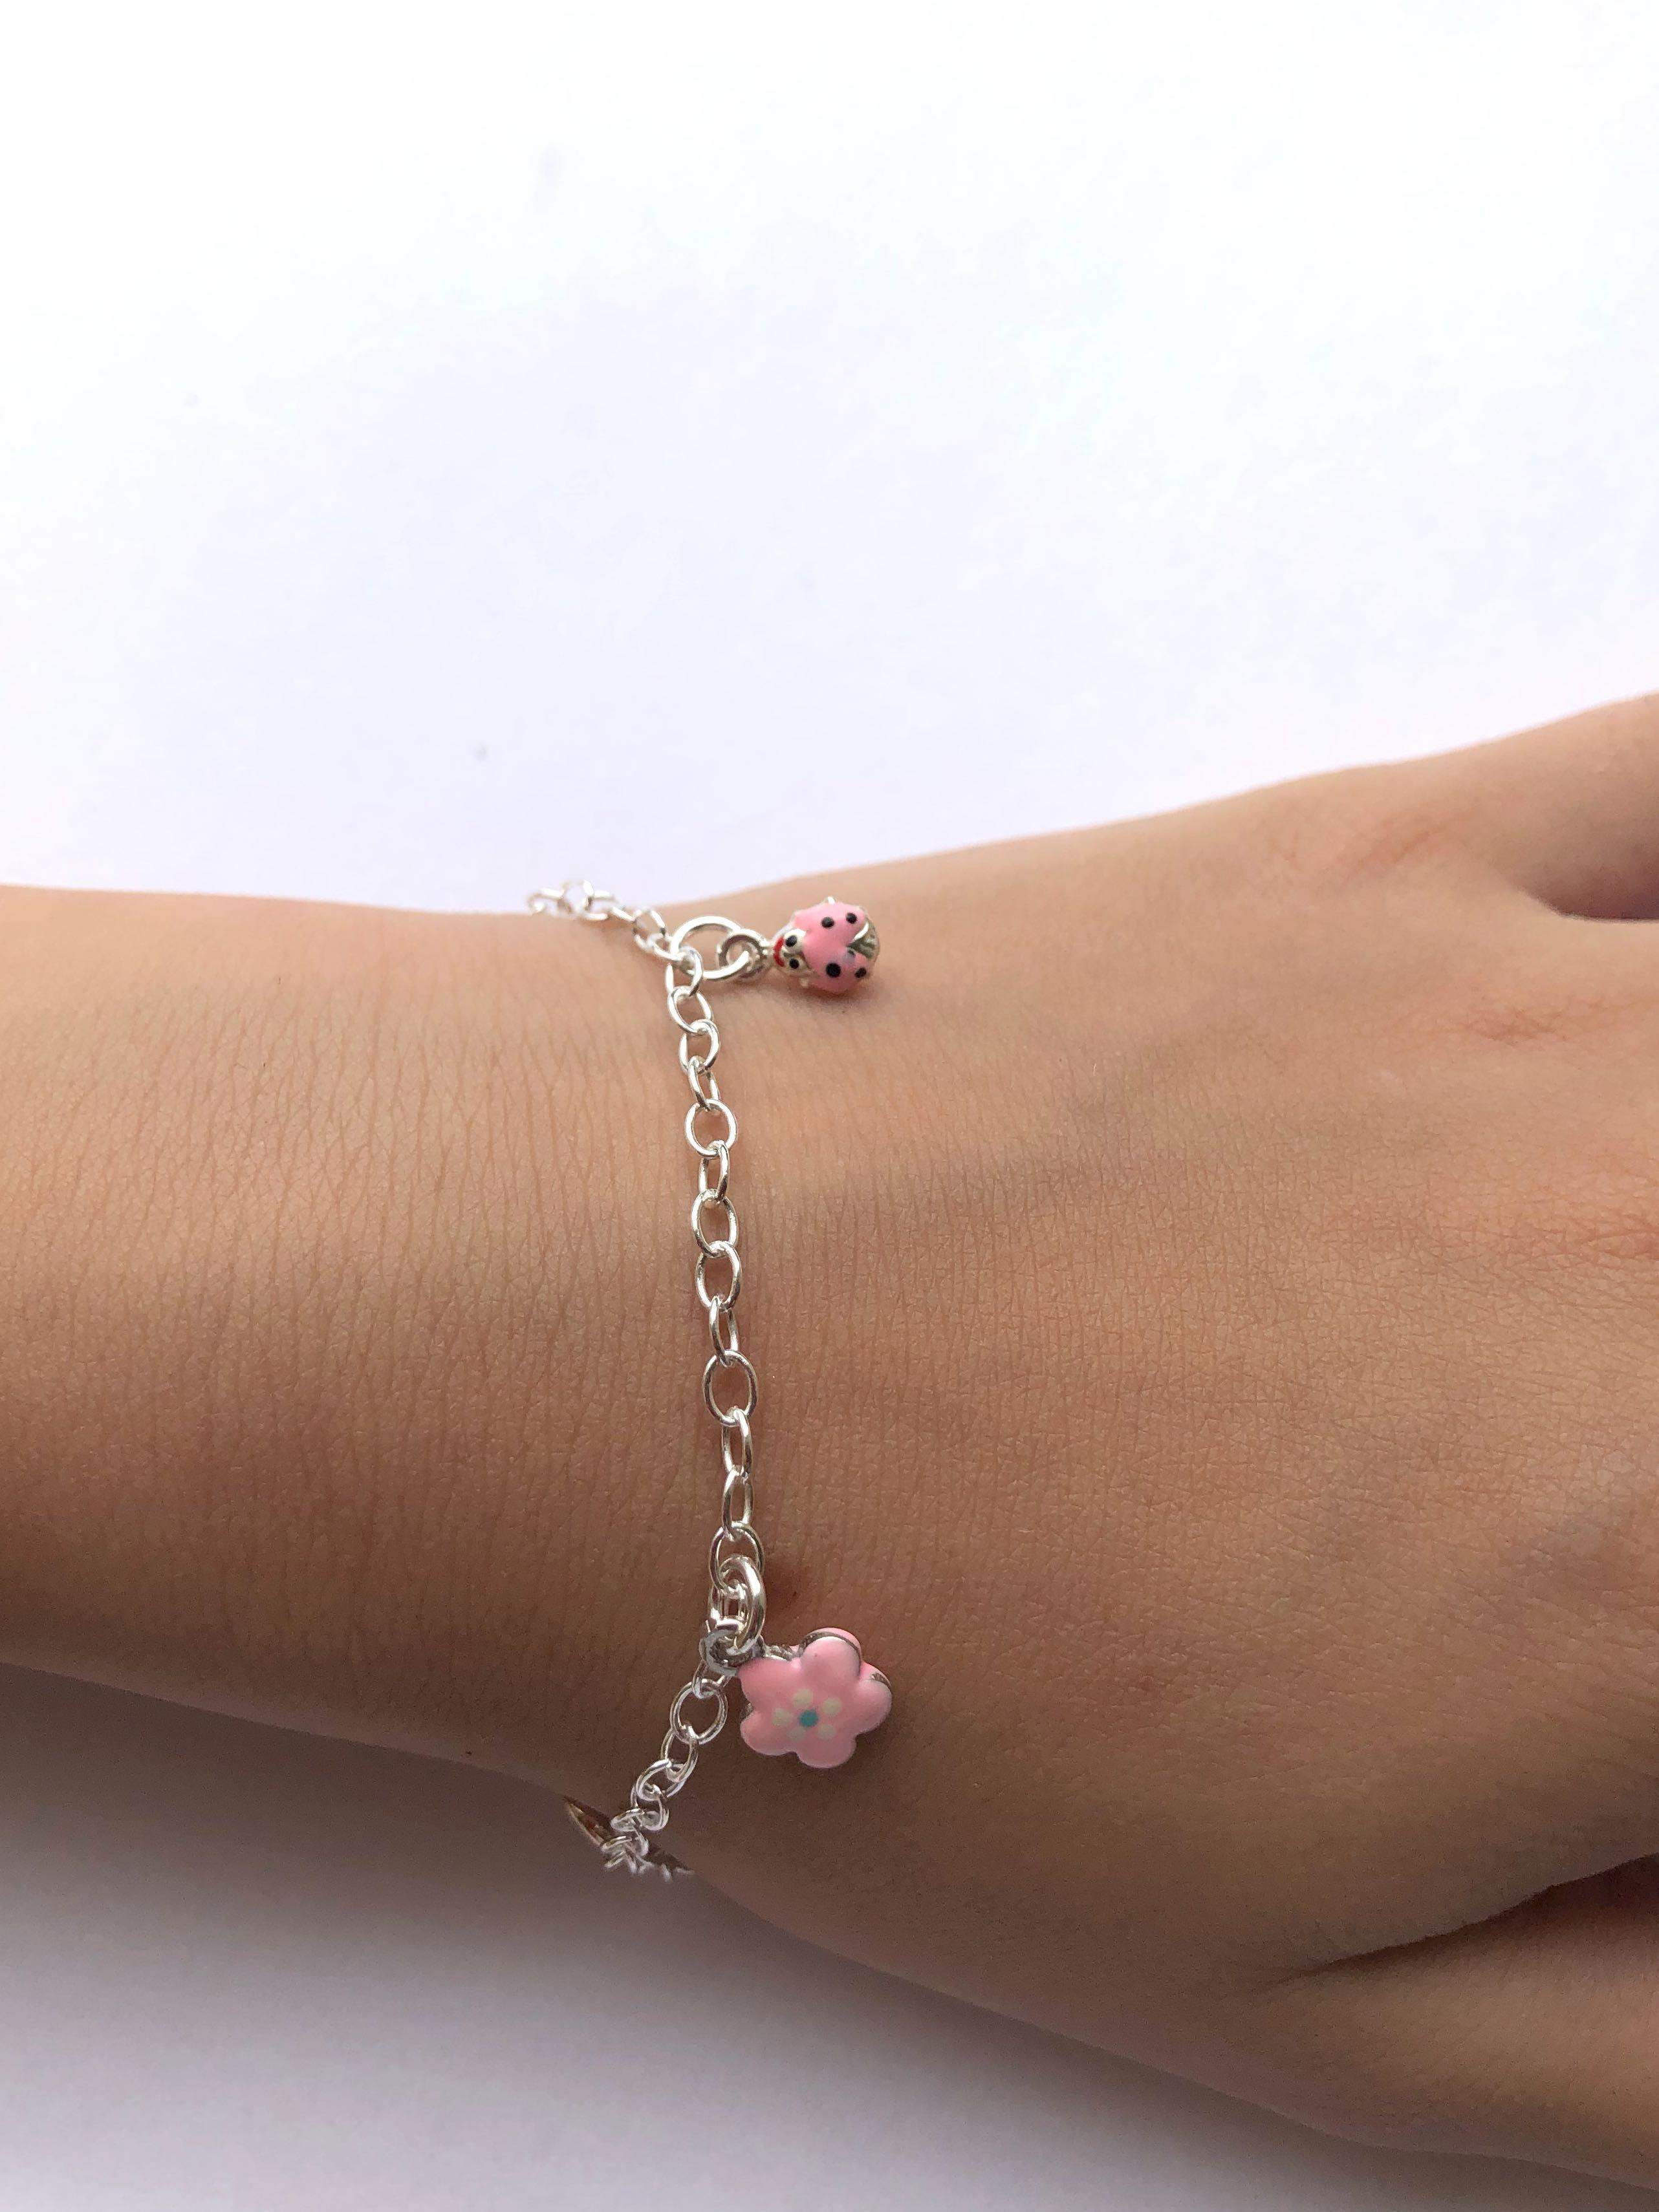 Italian Garden Series Bracelet